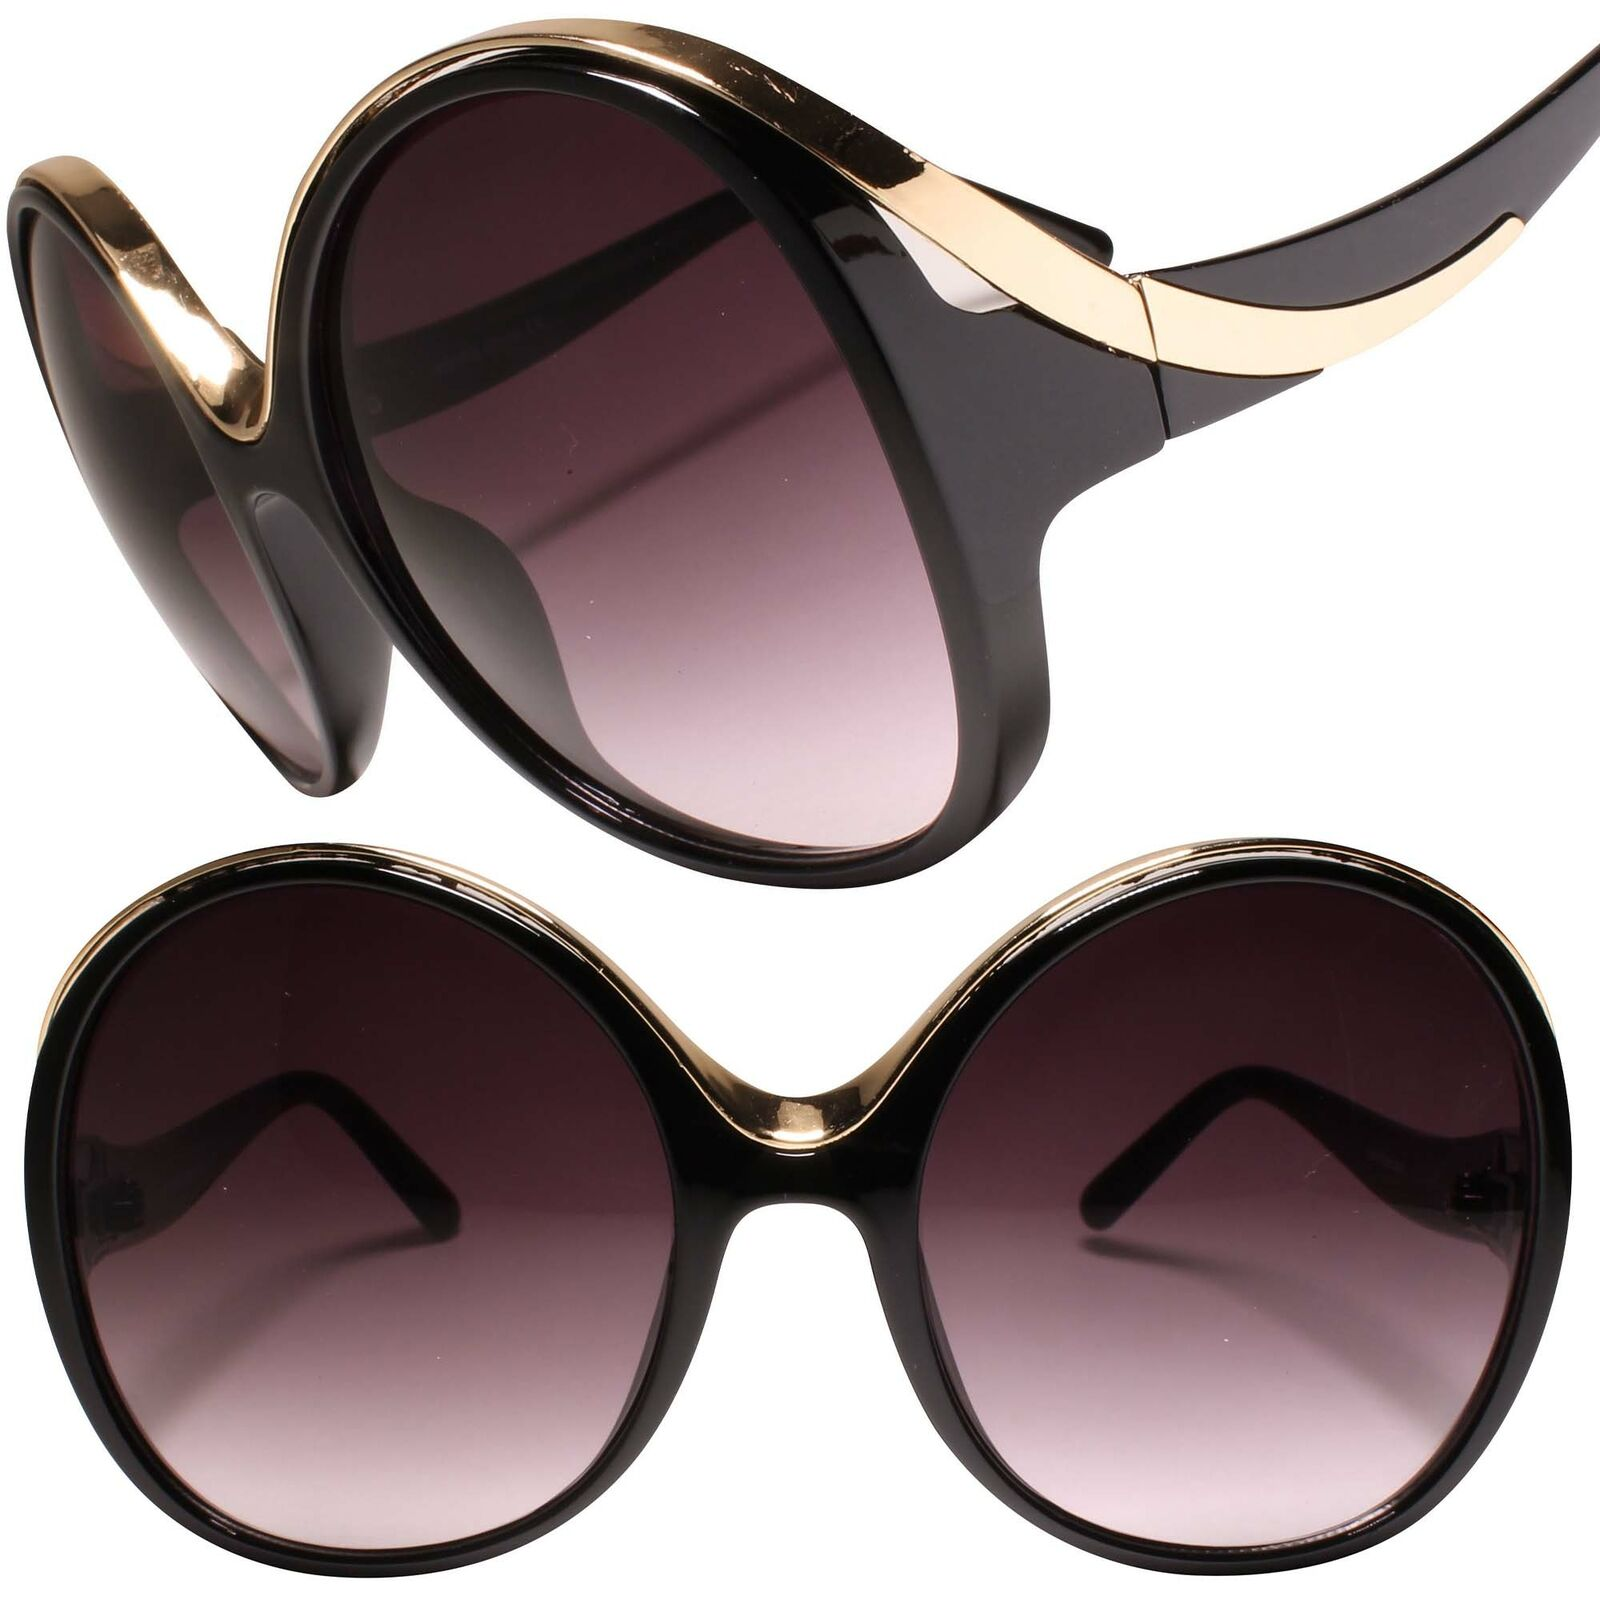 Classy Retro Oversized Large Exaggerated Womens Round Sunglasses Black